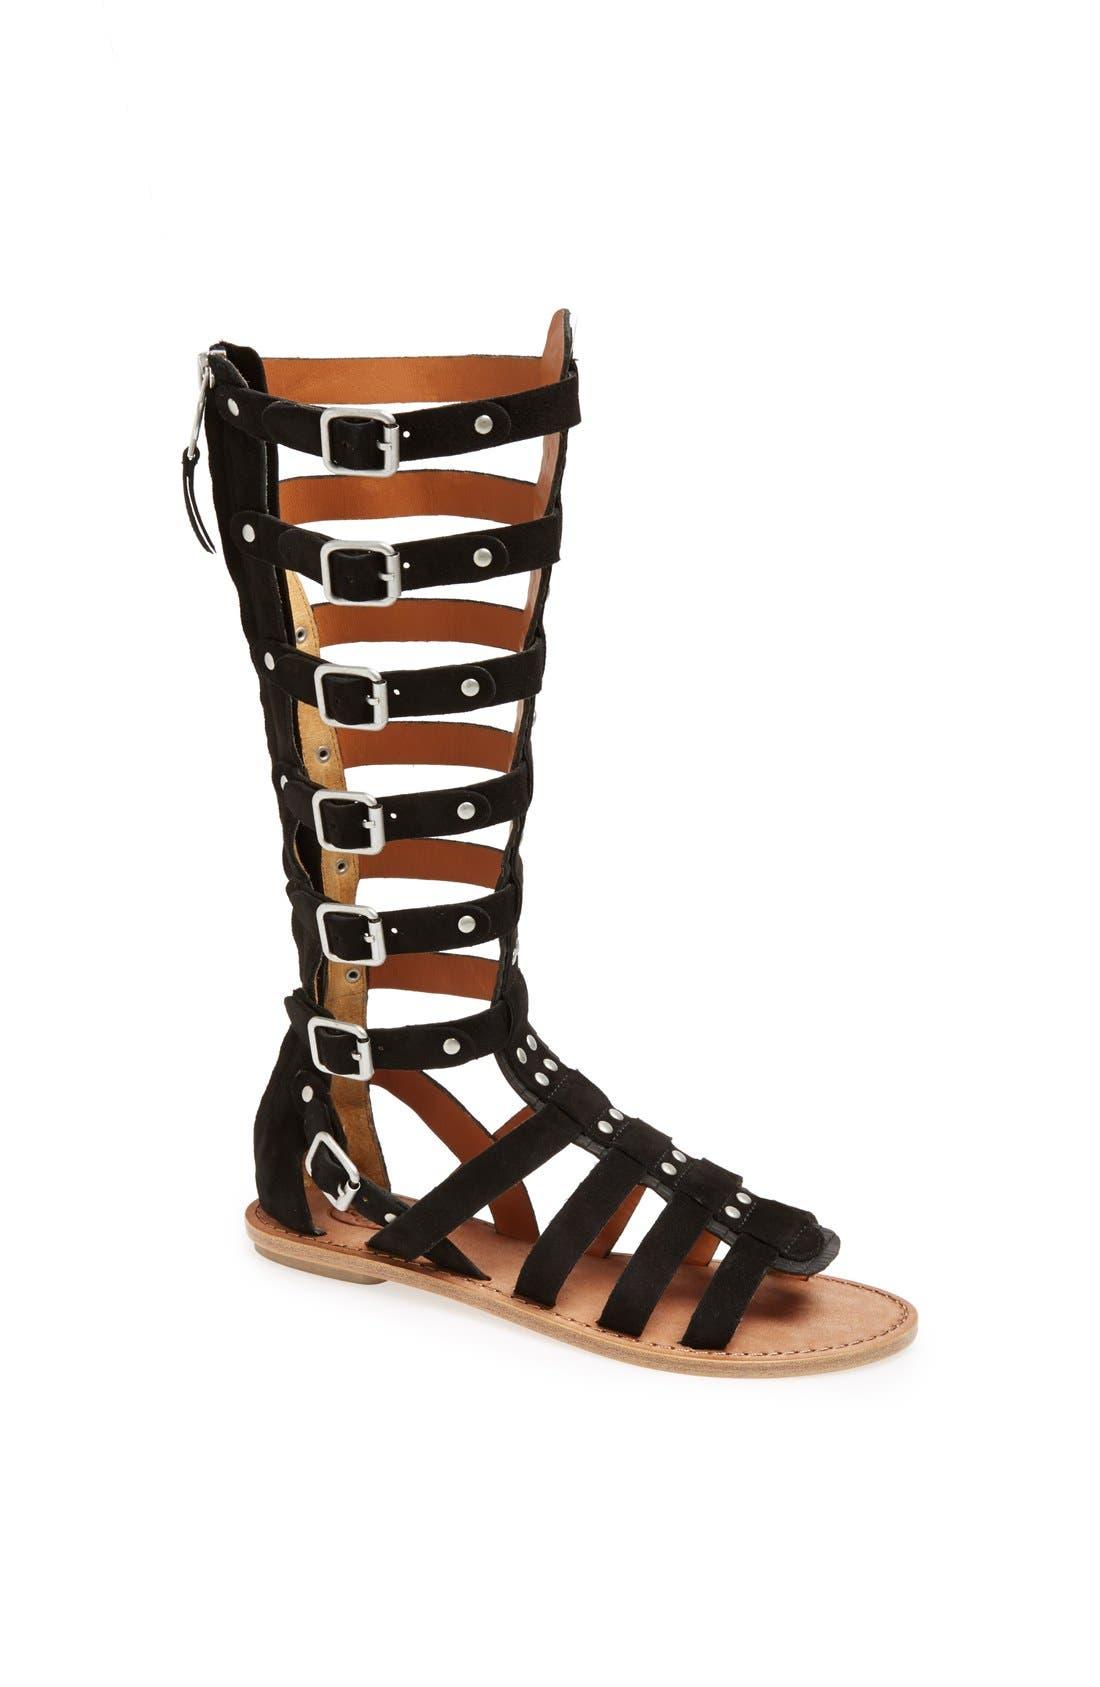 Main Image - Ash 'Nyphea' Gladiator Sandal